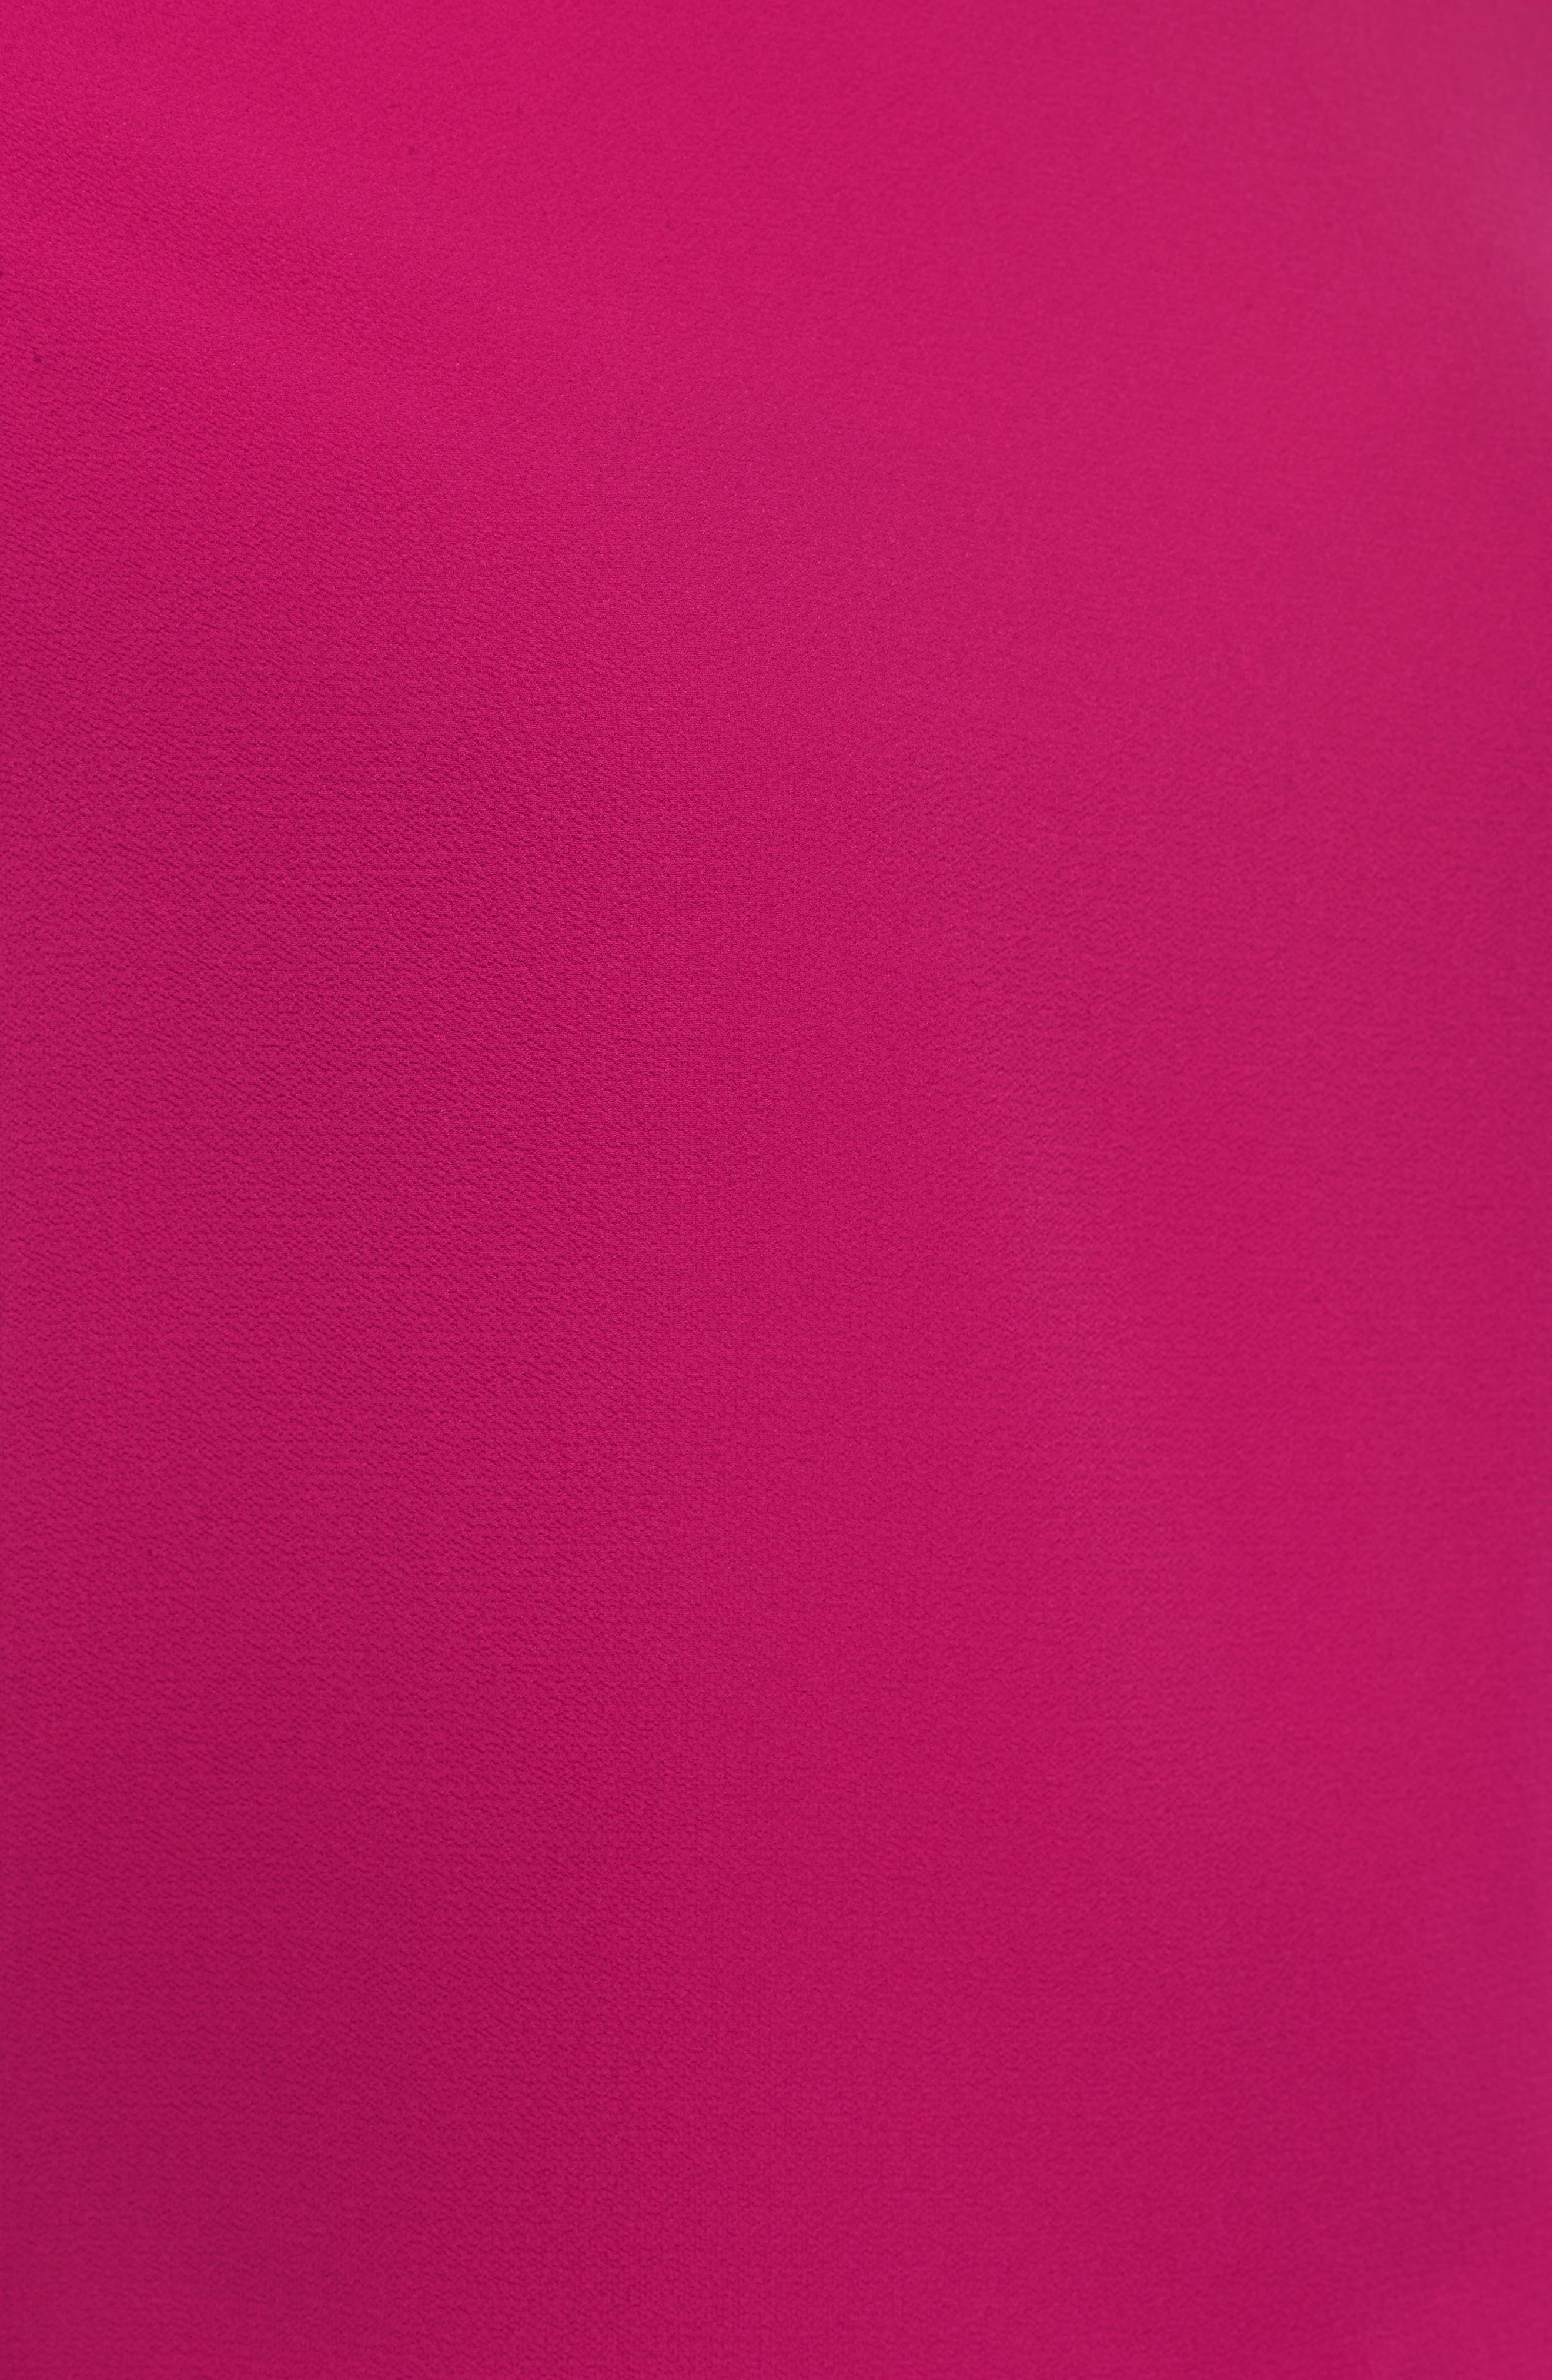 Bell Sleeve Blouse,                             Alternate thumbnail 5, color,                             646